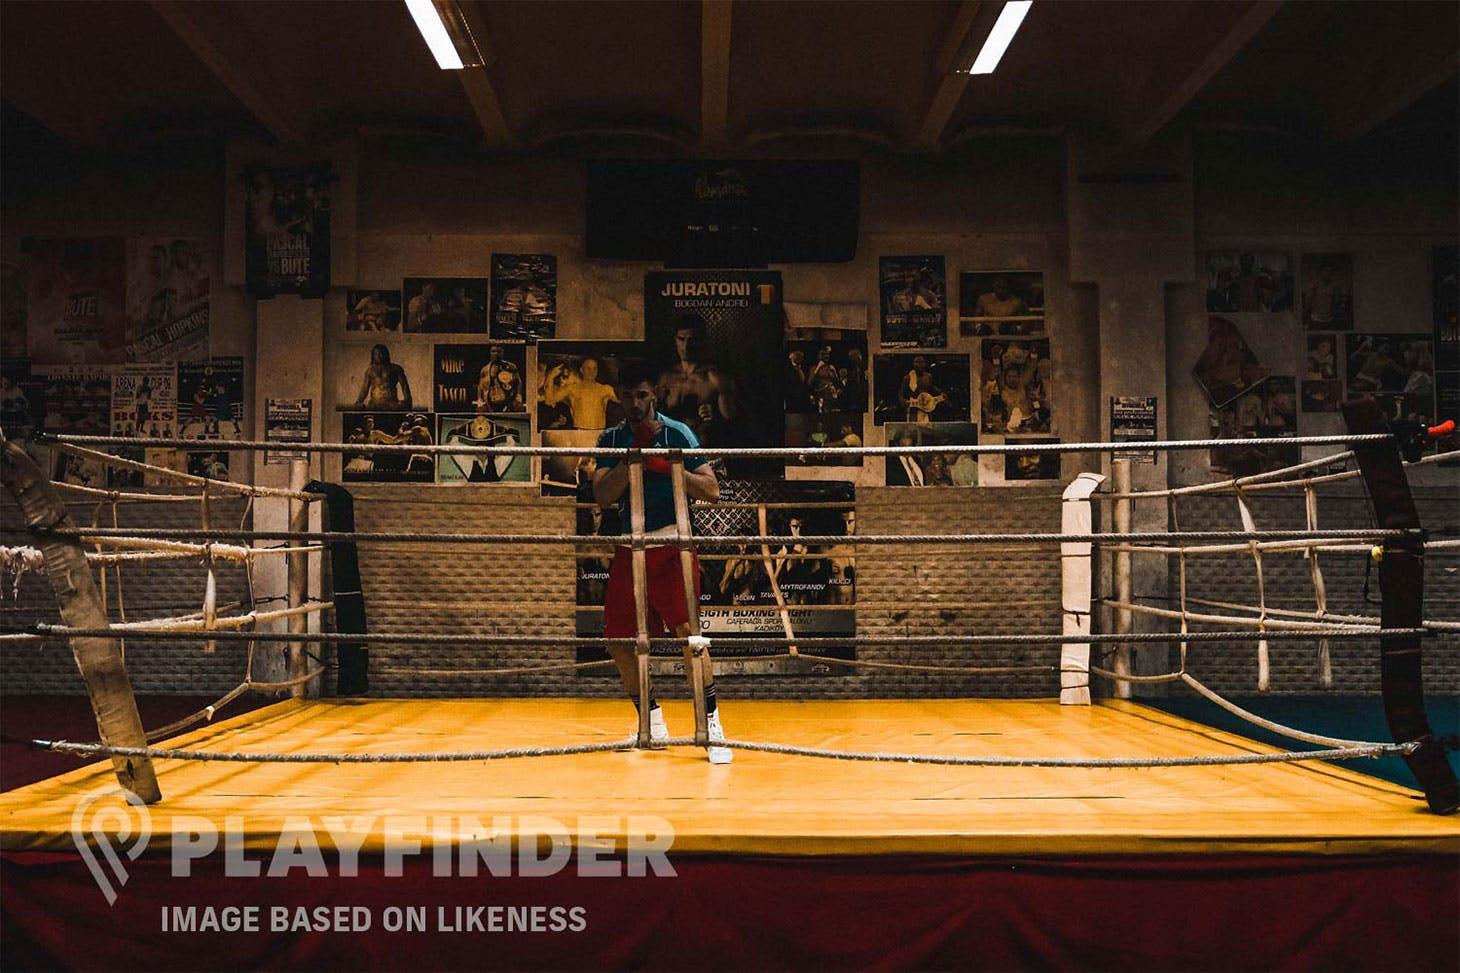 Leyton Sports Ground Boxing gym   Hard gym